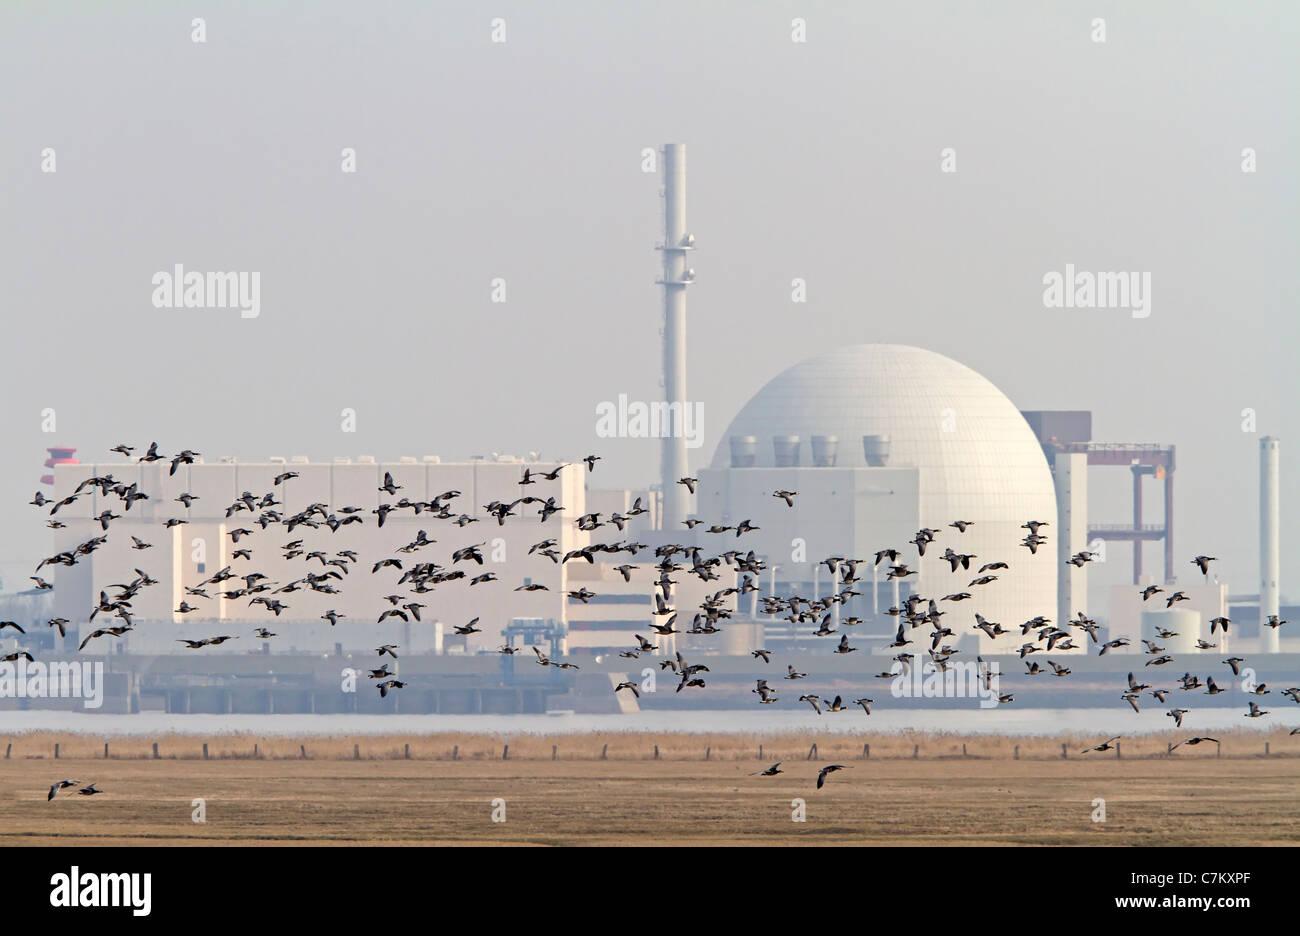 Barnacles with atomic power plant Brokdorf (Branta leucopsis) - Stock Image